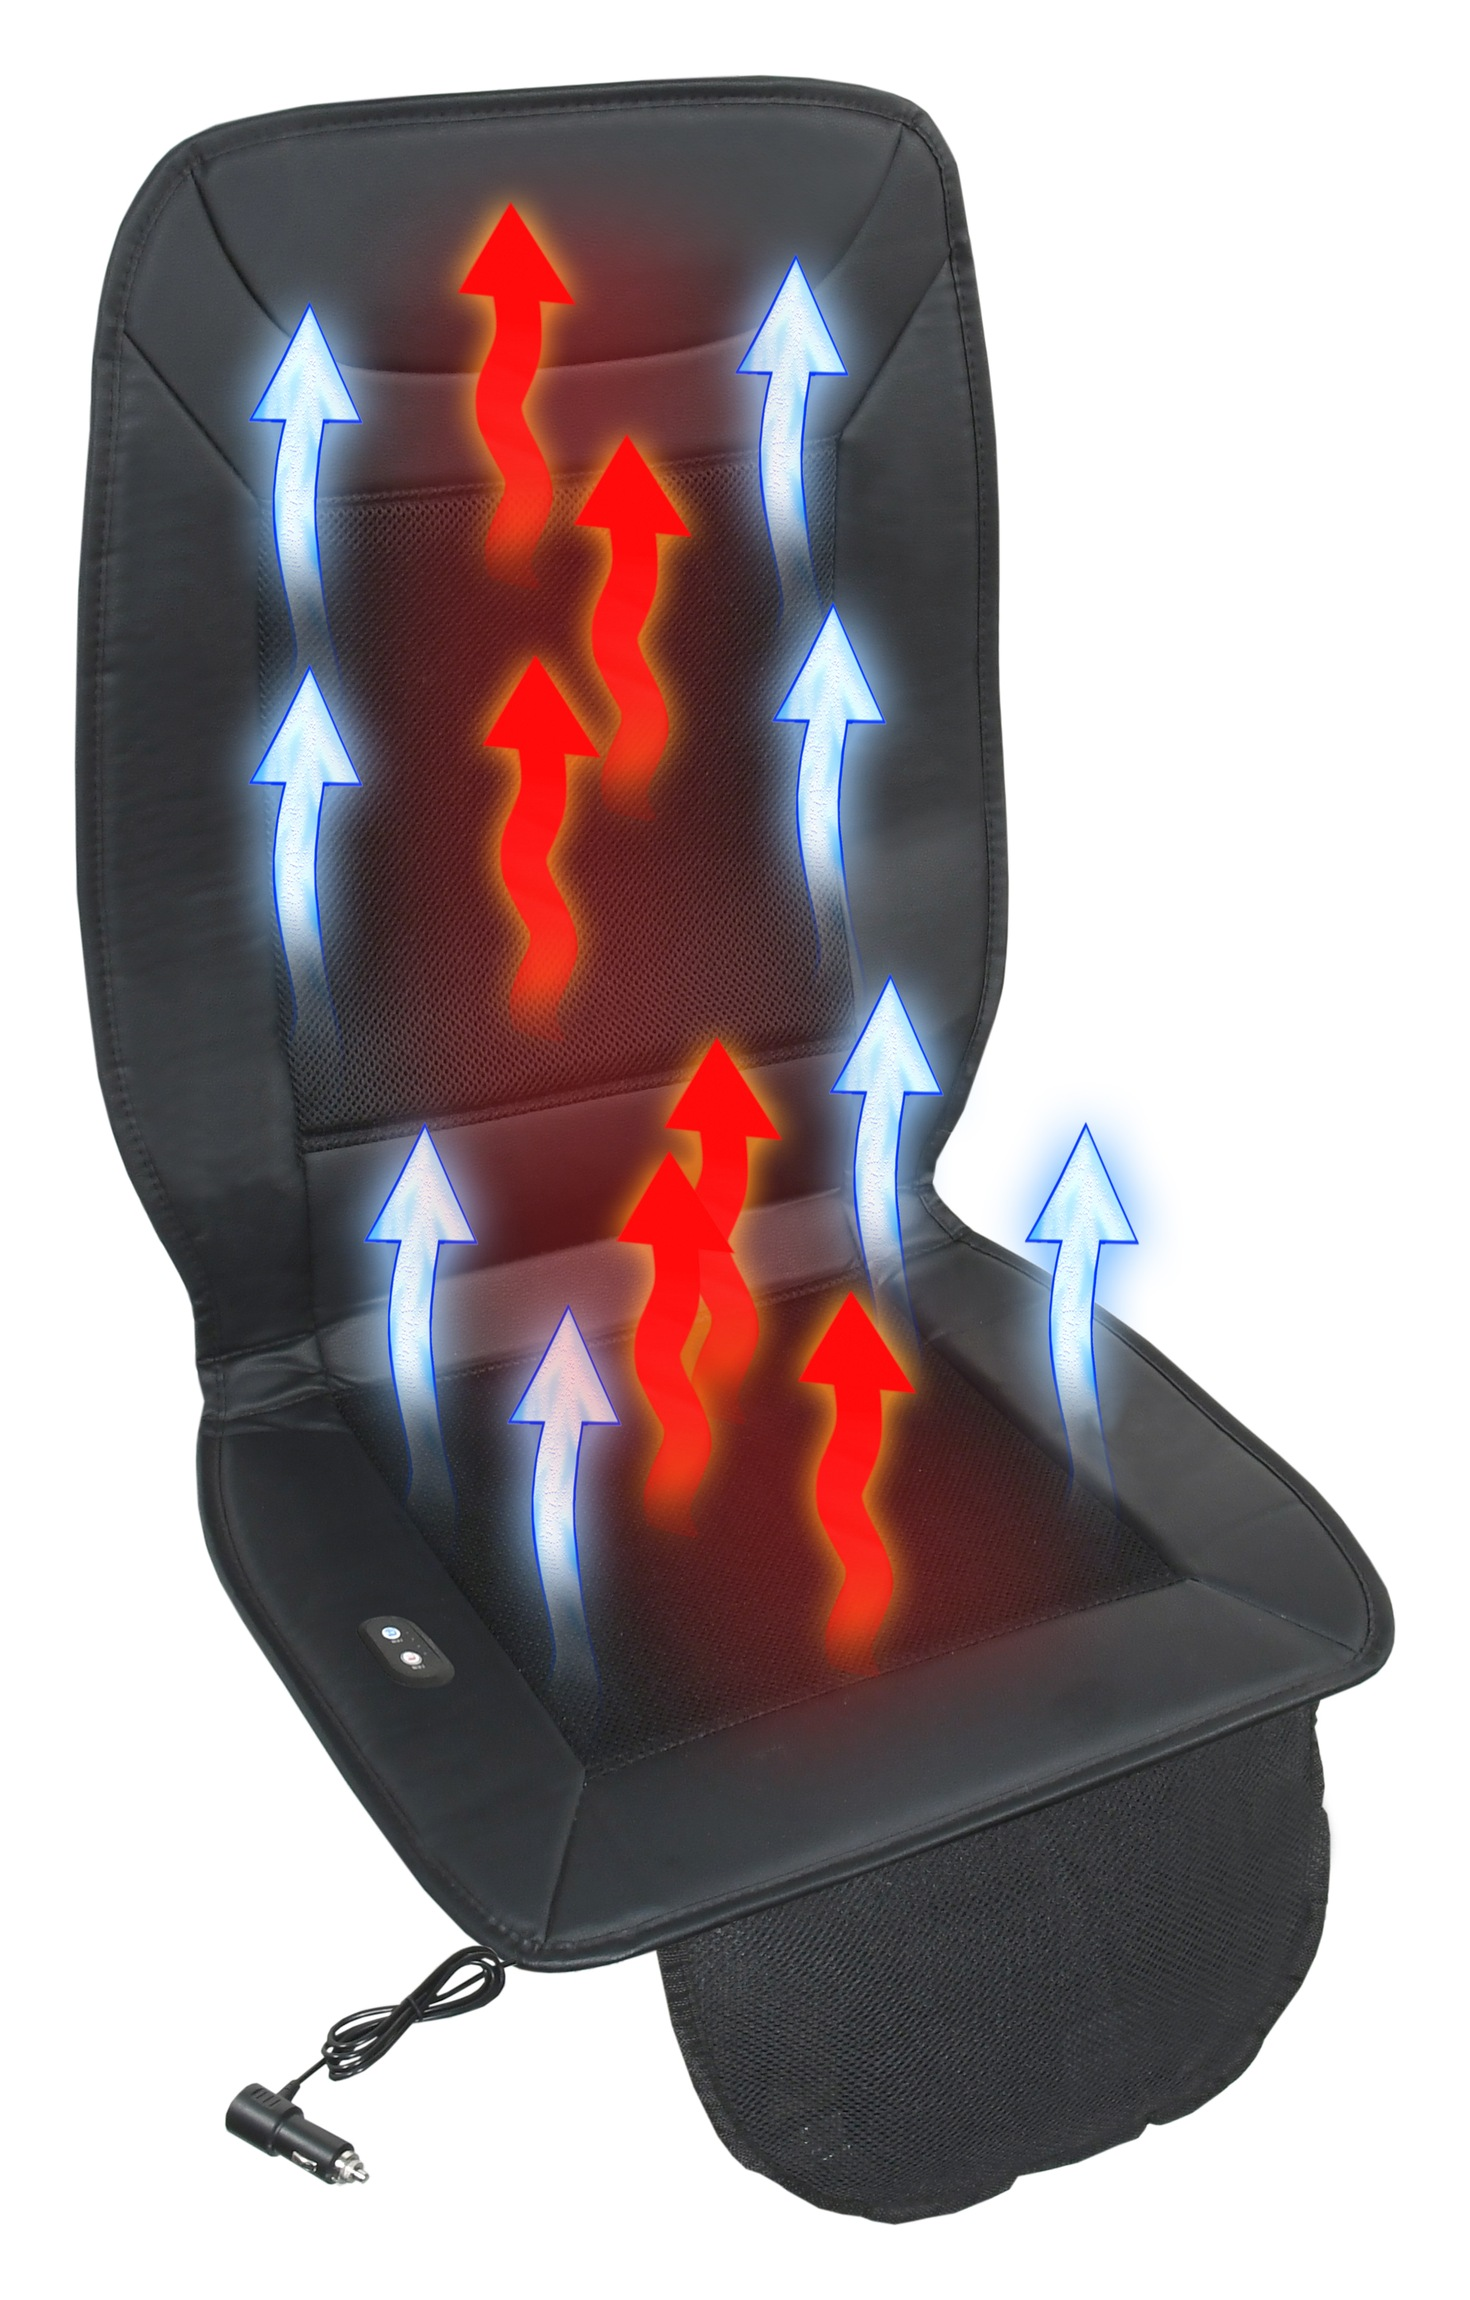 Potah sedadla vyhřívaný s ventilací 12V SEASONS